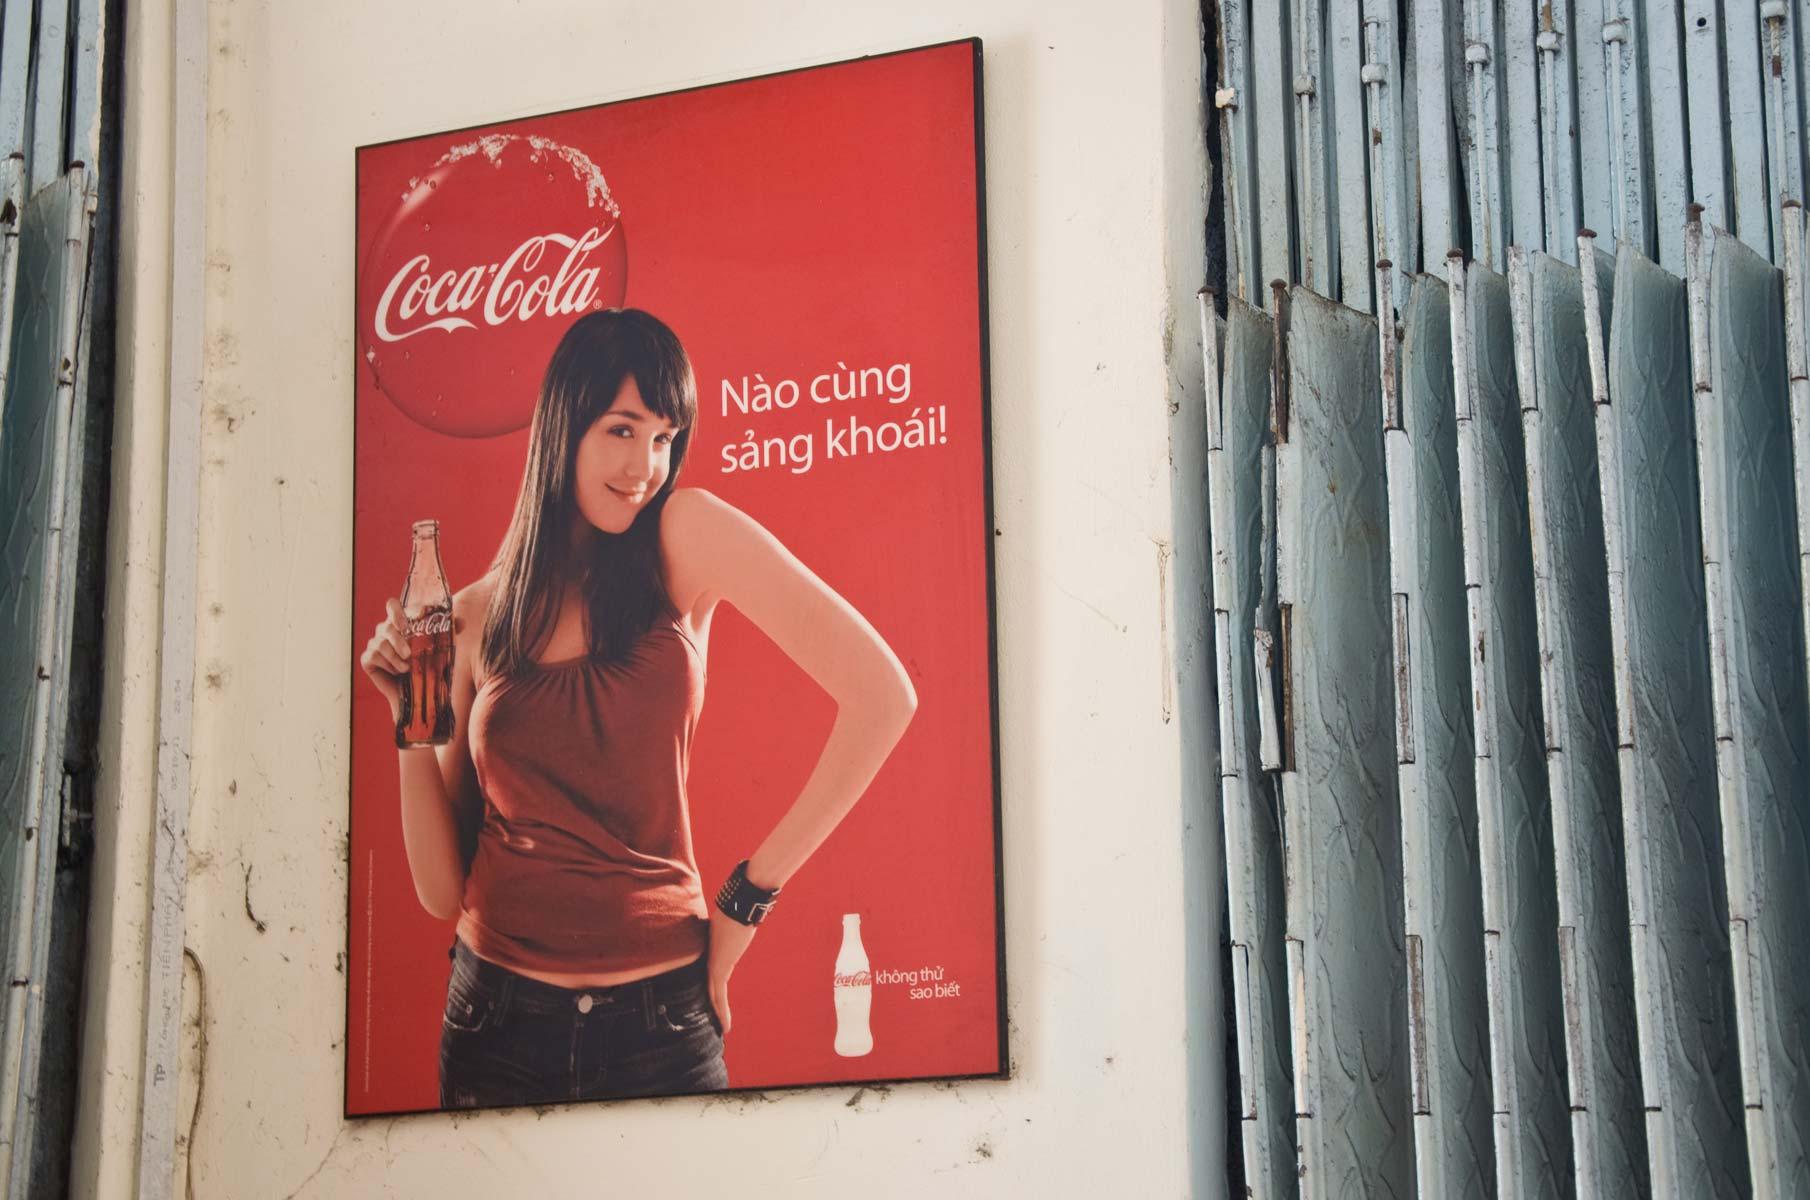 Coca-Cola Werbeposter in Saigon (Ho-Chi-Minh Stadt), Vietnam